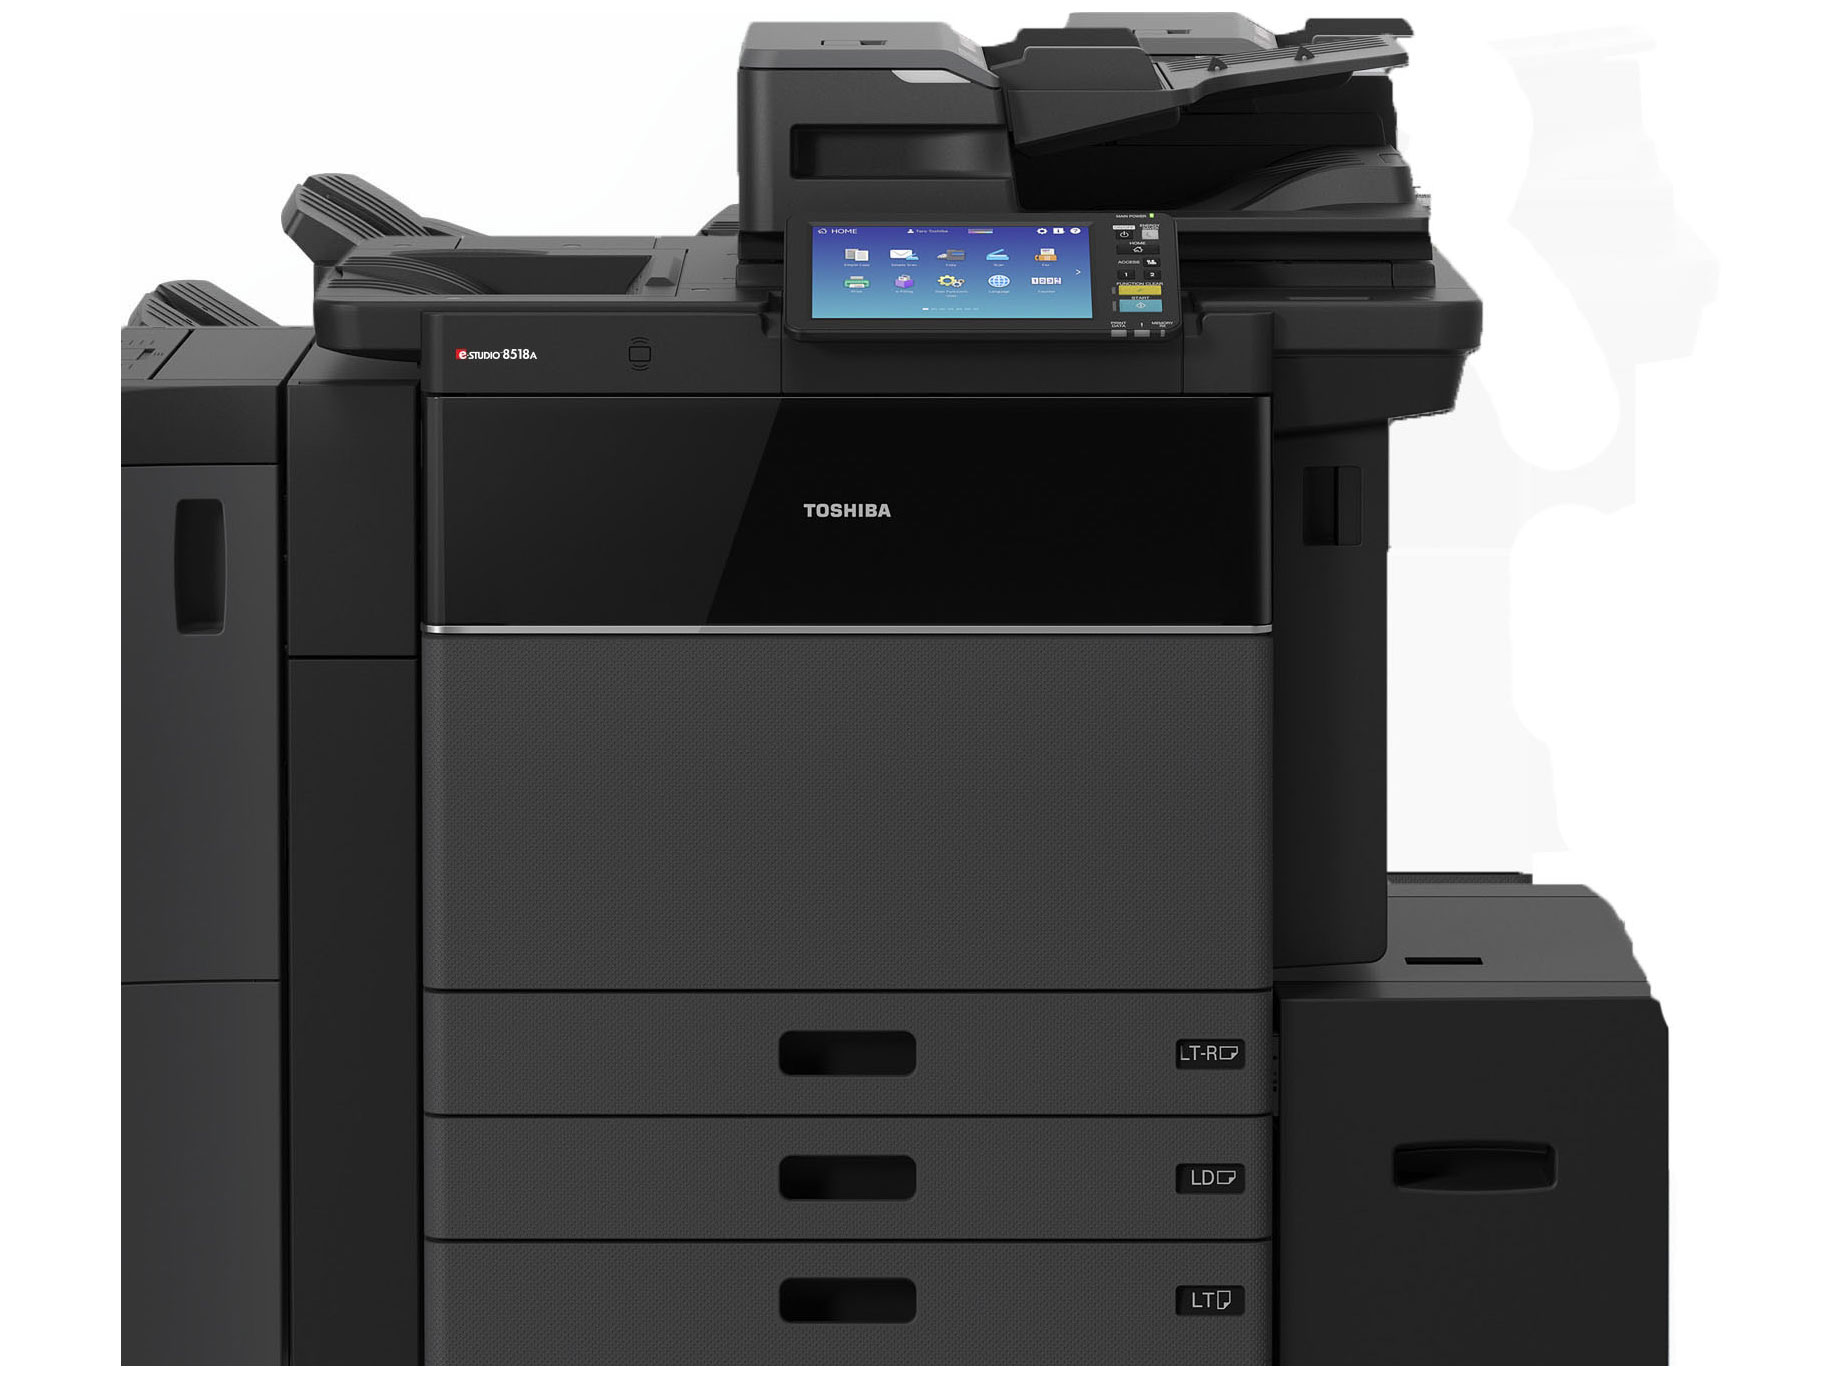 Fotocopiadora Toshiba e-STUDIO 6518A Barata